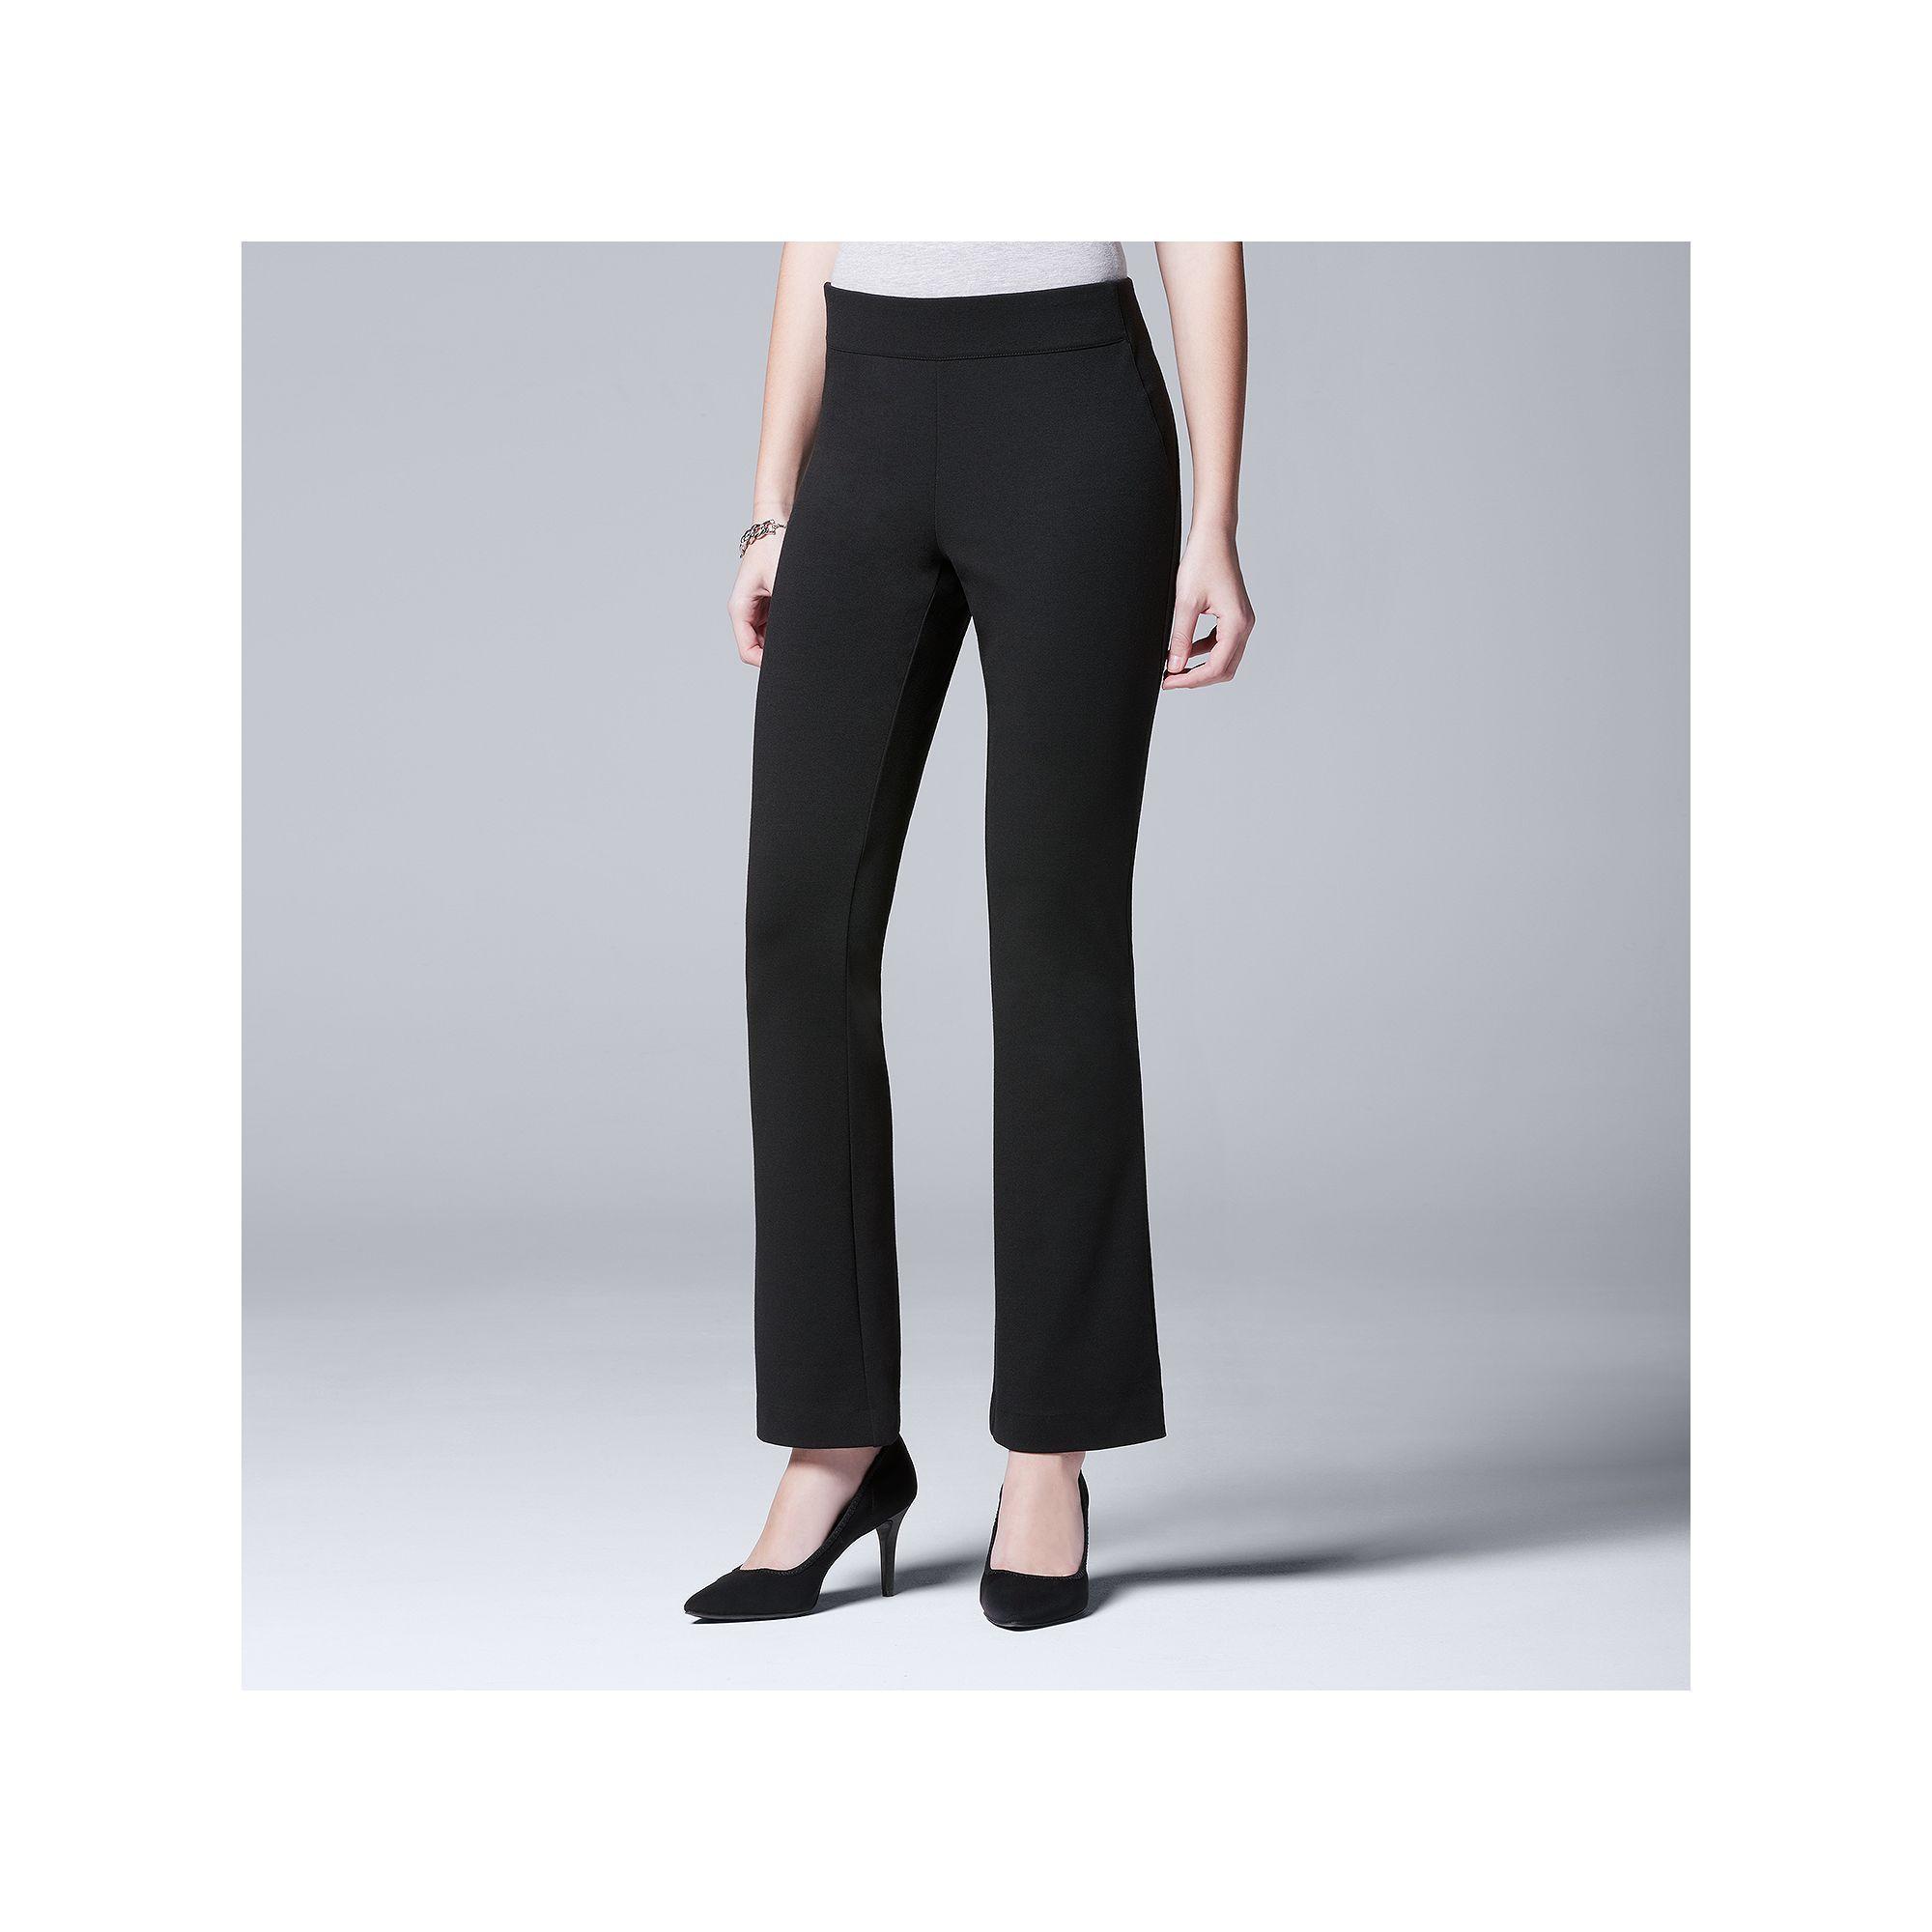 6e65add728 Women's Simply Vera Vera Wang Ponte Bootcut Pants | Products ...